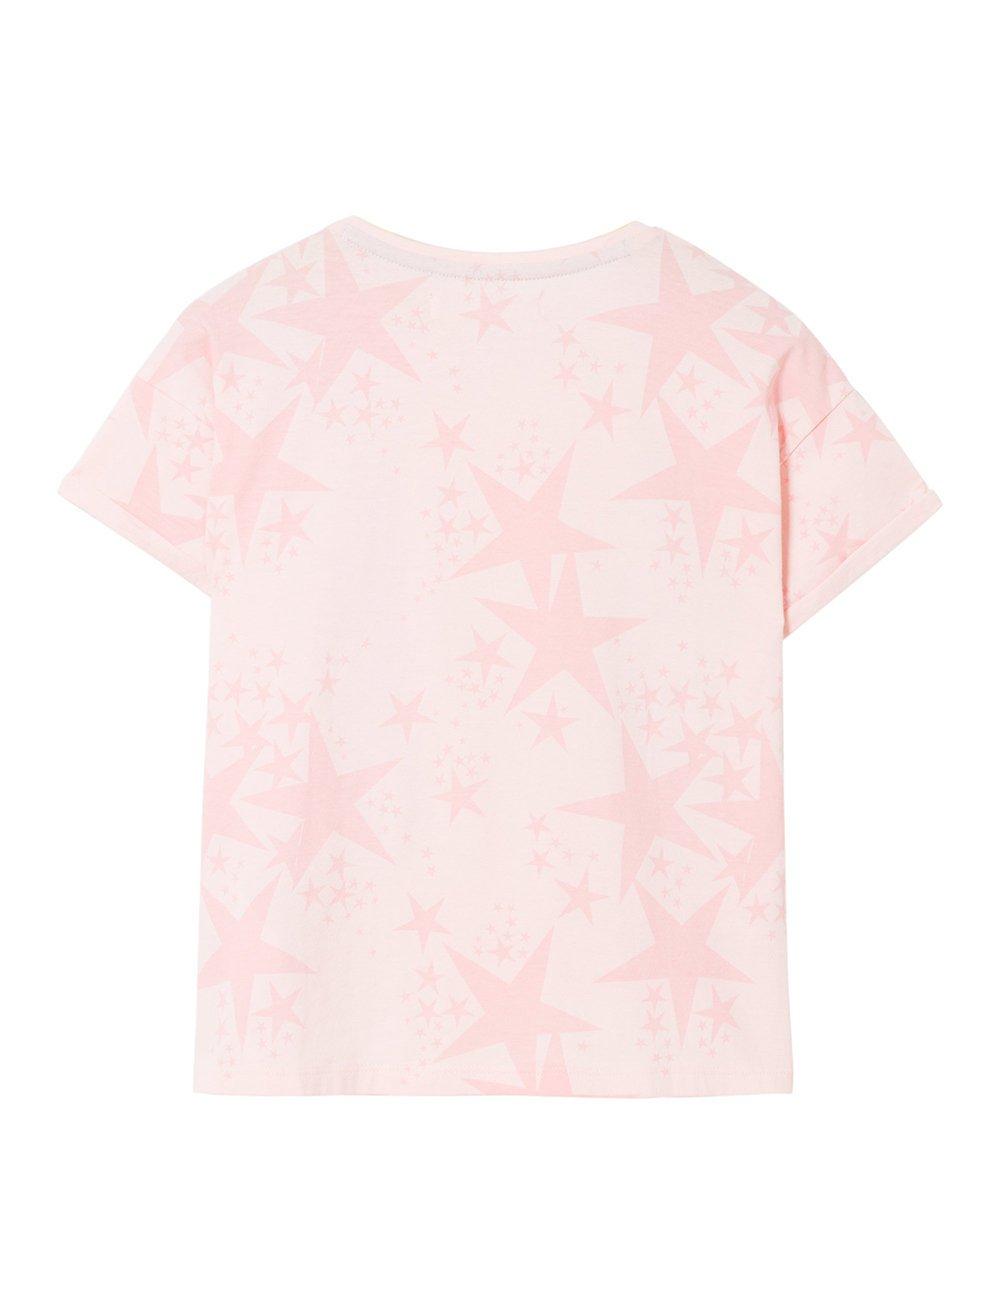 Desigual TS_Elena Camiseta para Niñas